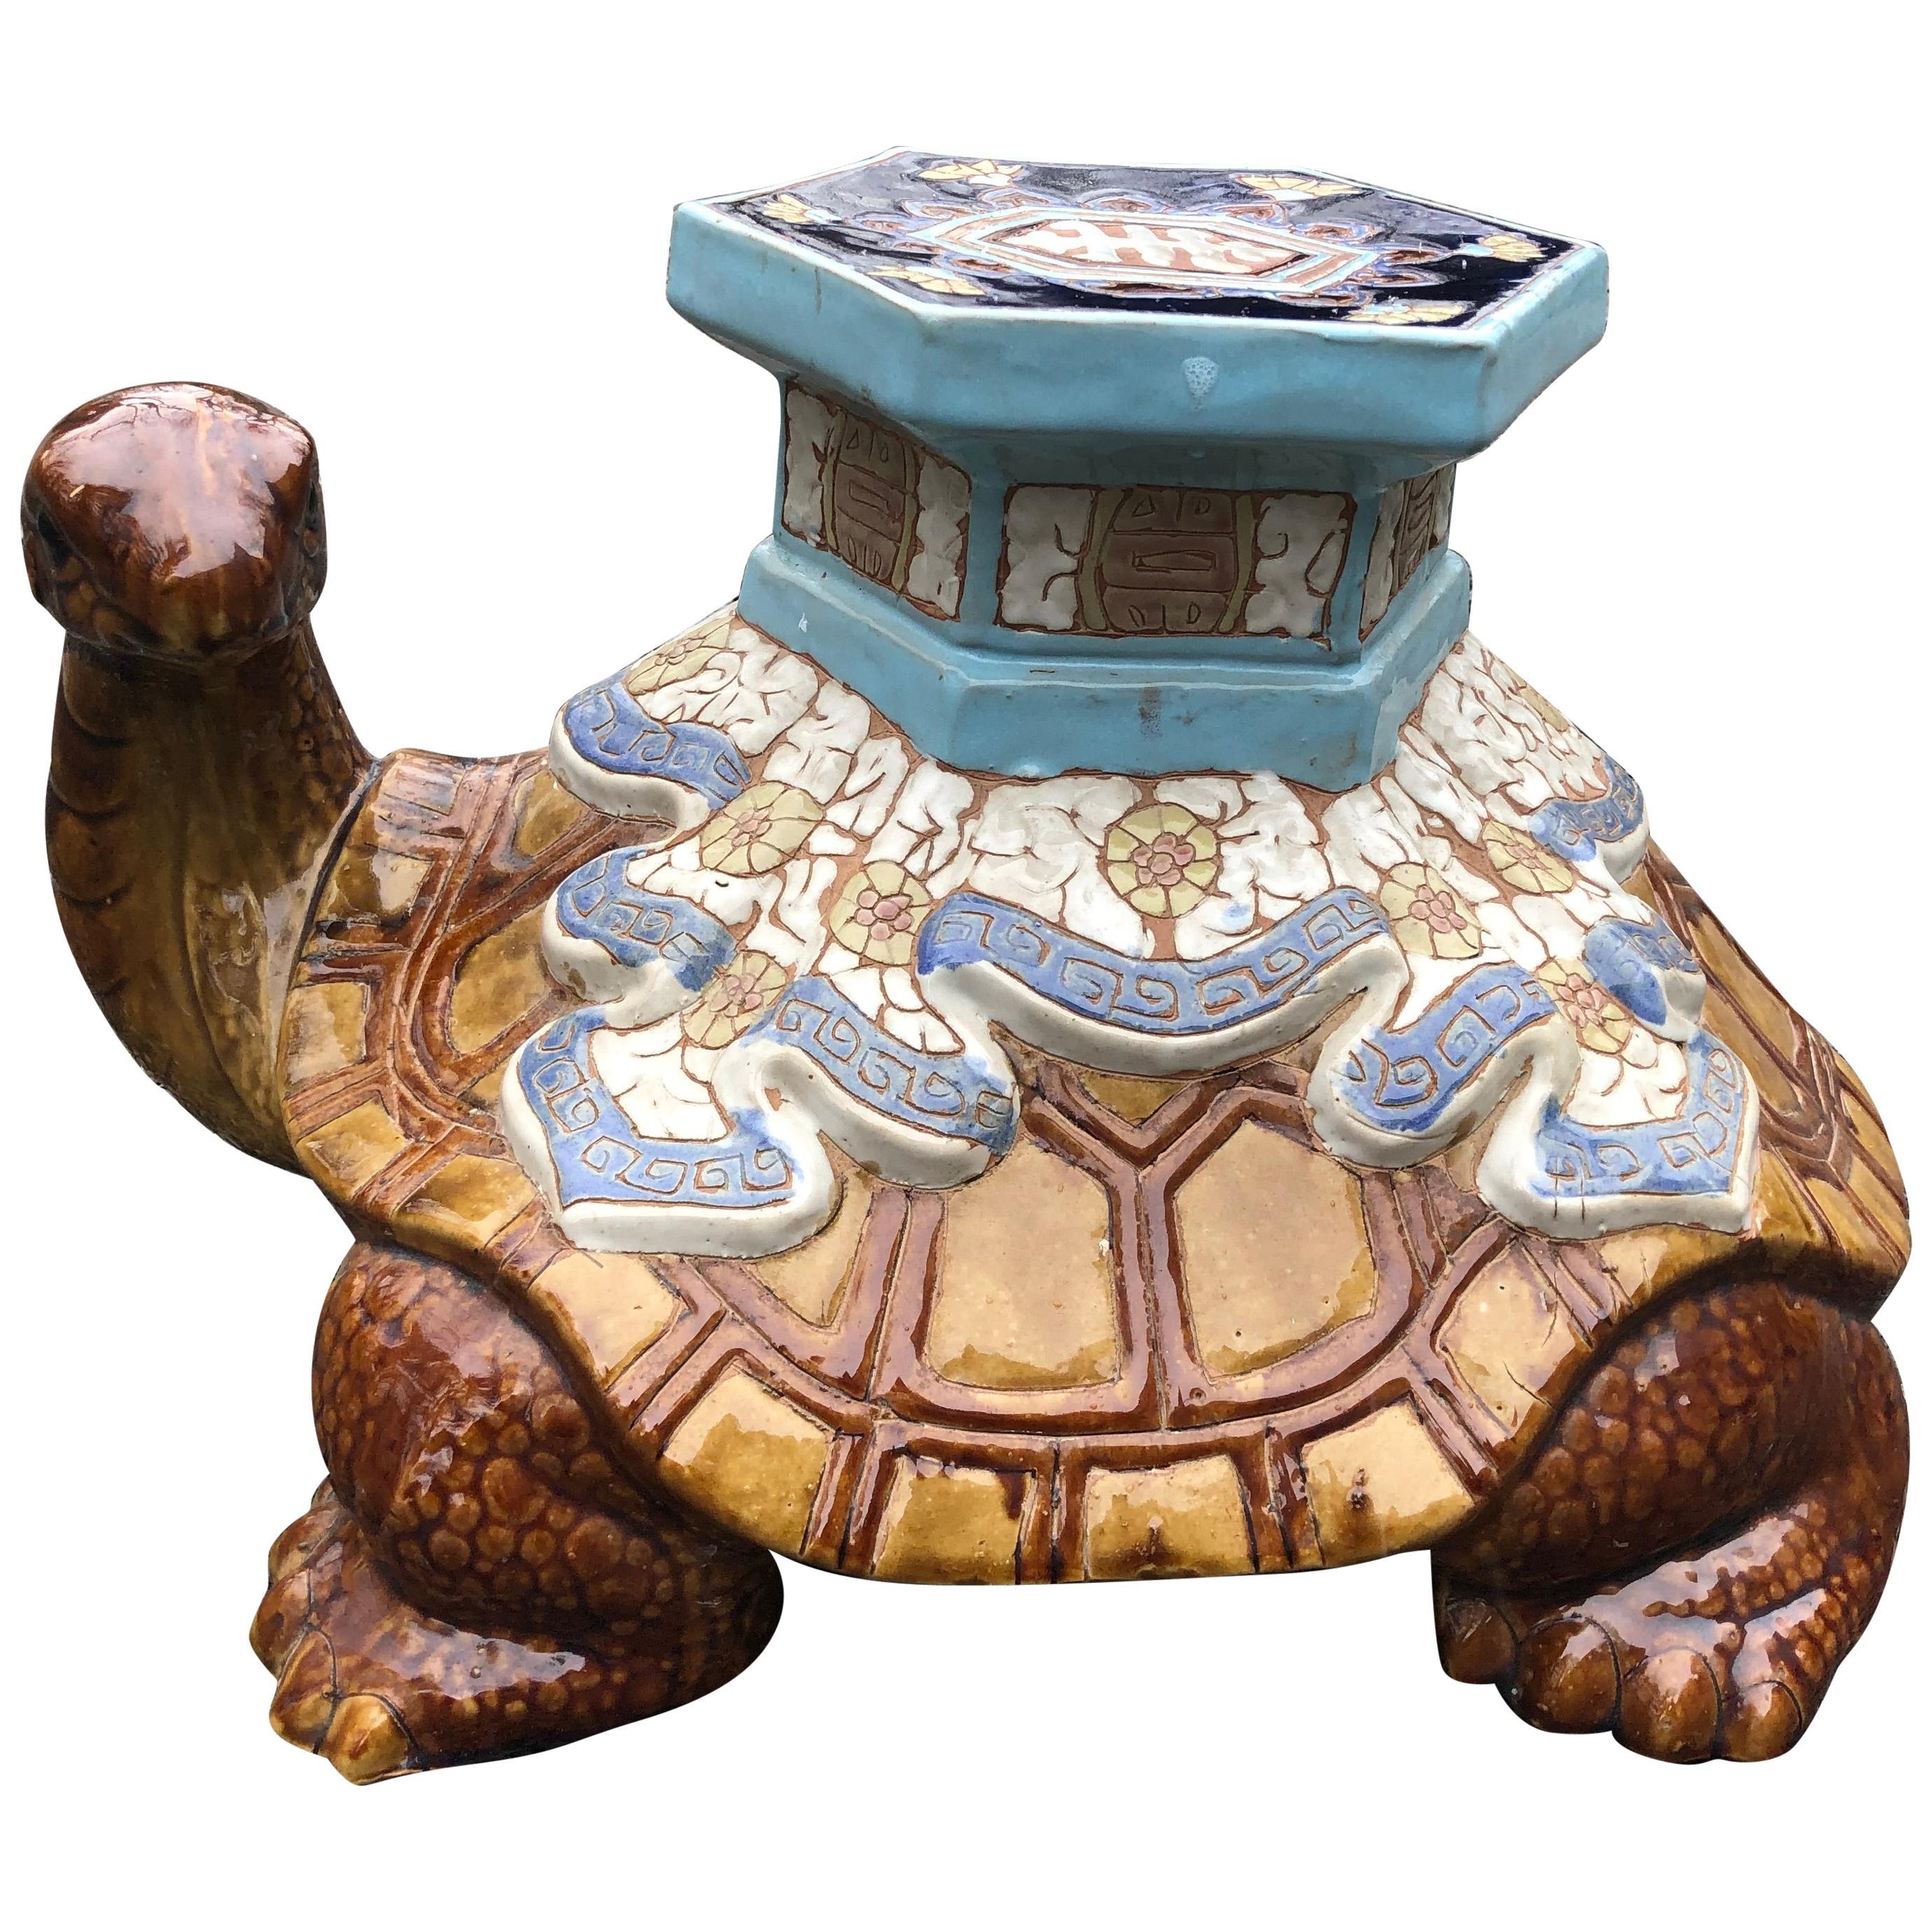 Unusual Vintage Ceramic Turtle Garden Seat End Table